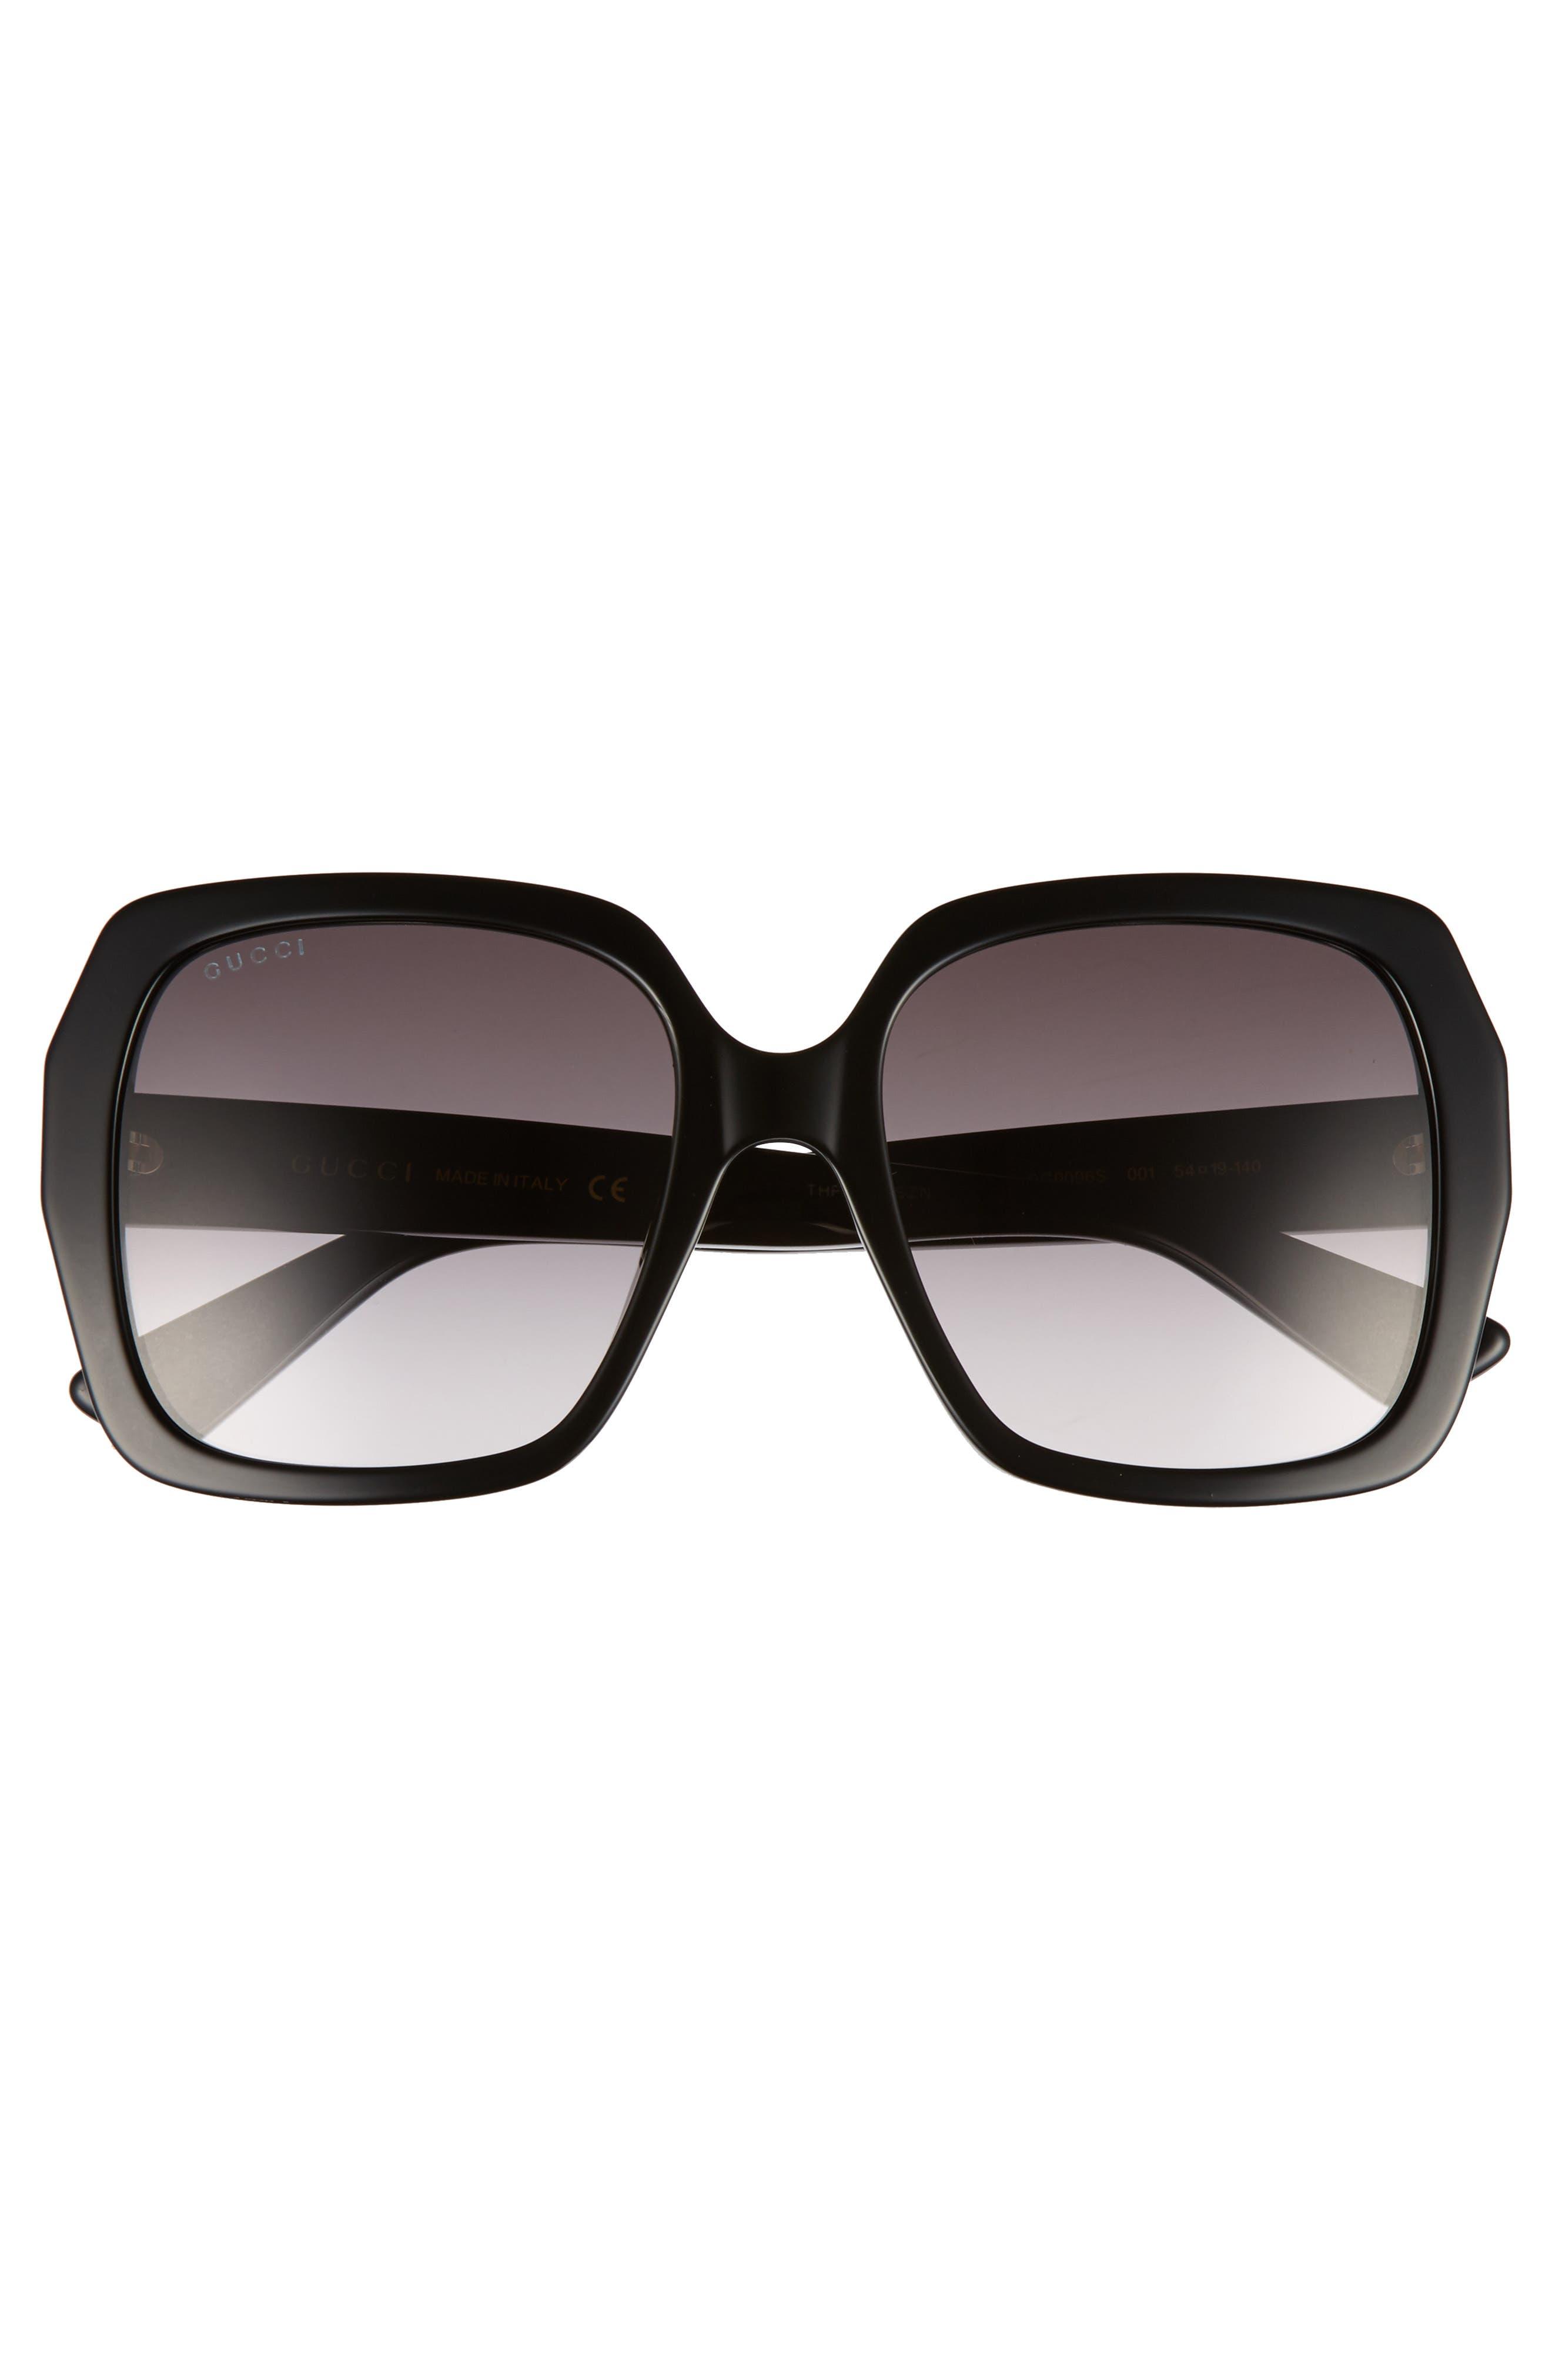 54mm Gradient Square Sunglasses,                             Alternate thumbnail 3, color,                             Black/ Grey